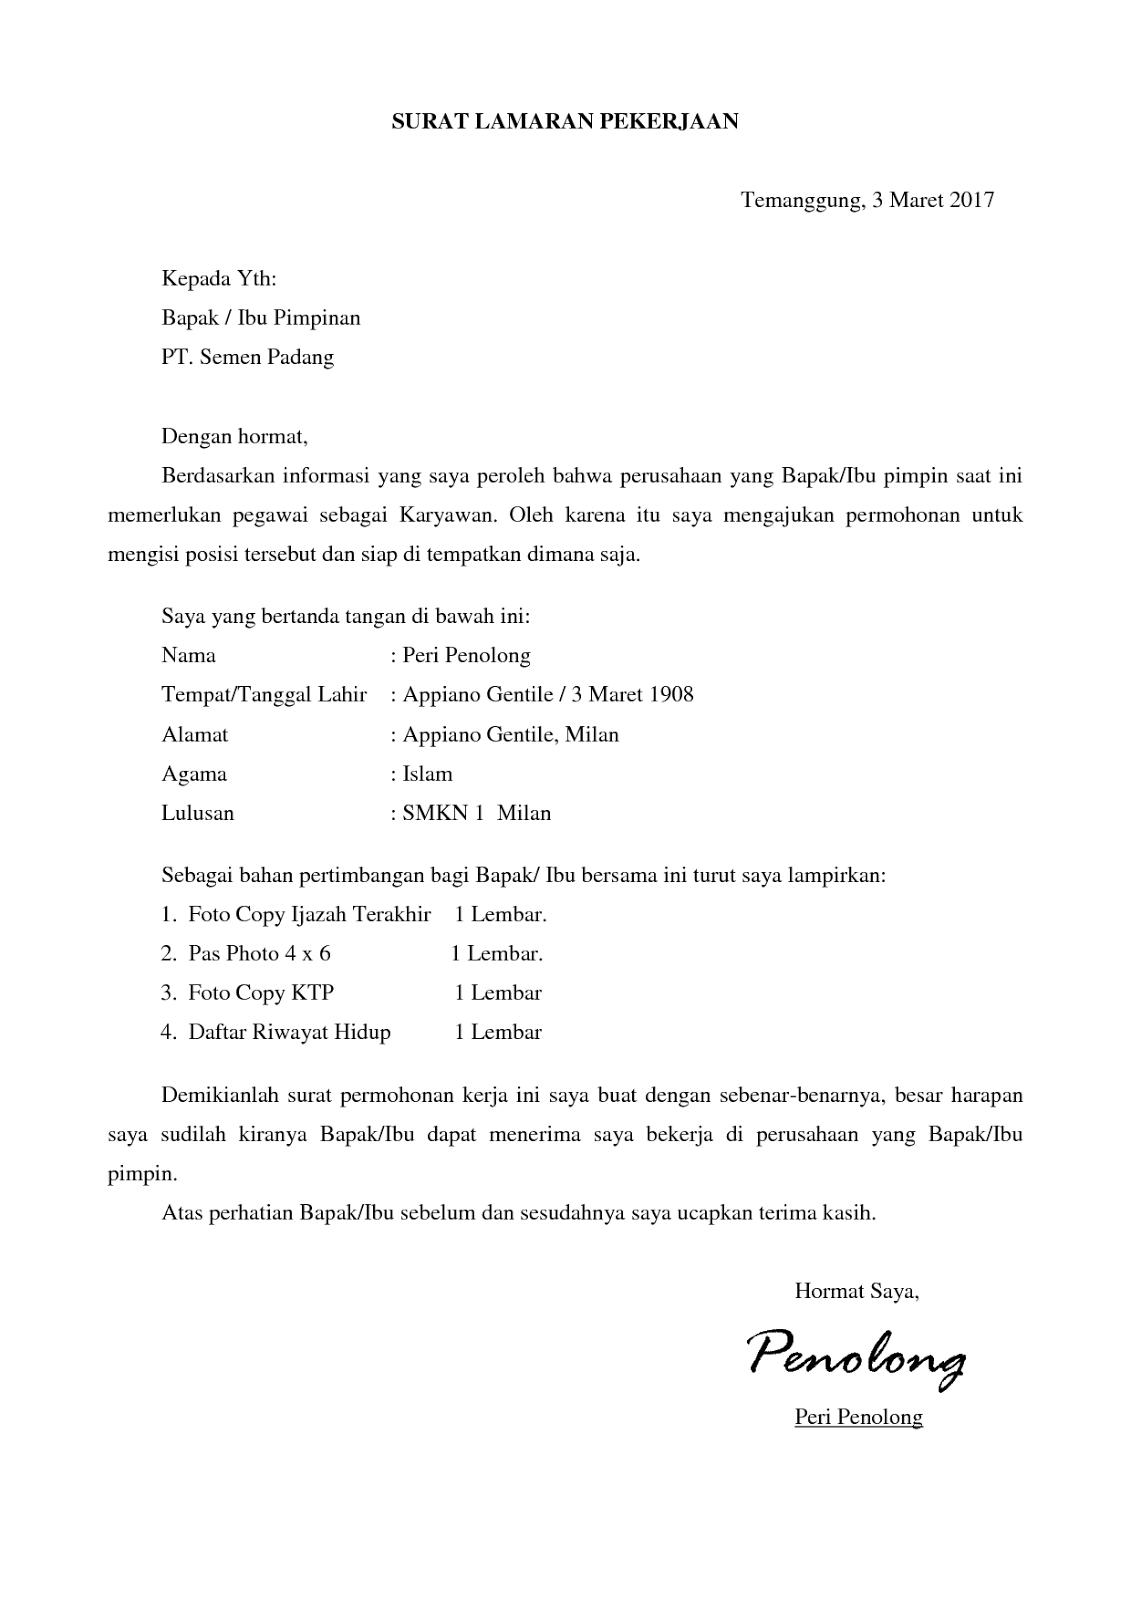 Surat Lamaran Kerja Kreatif ben jobs Surat, Desain cv